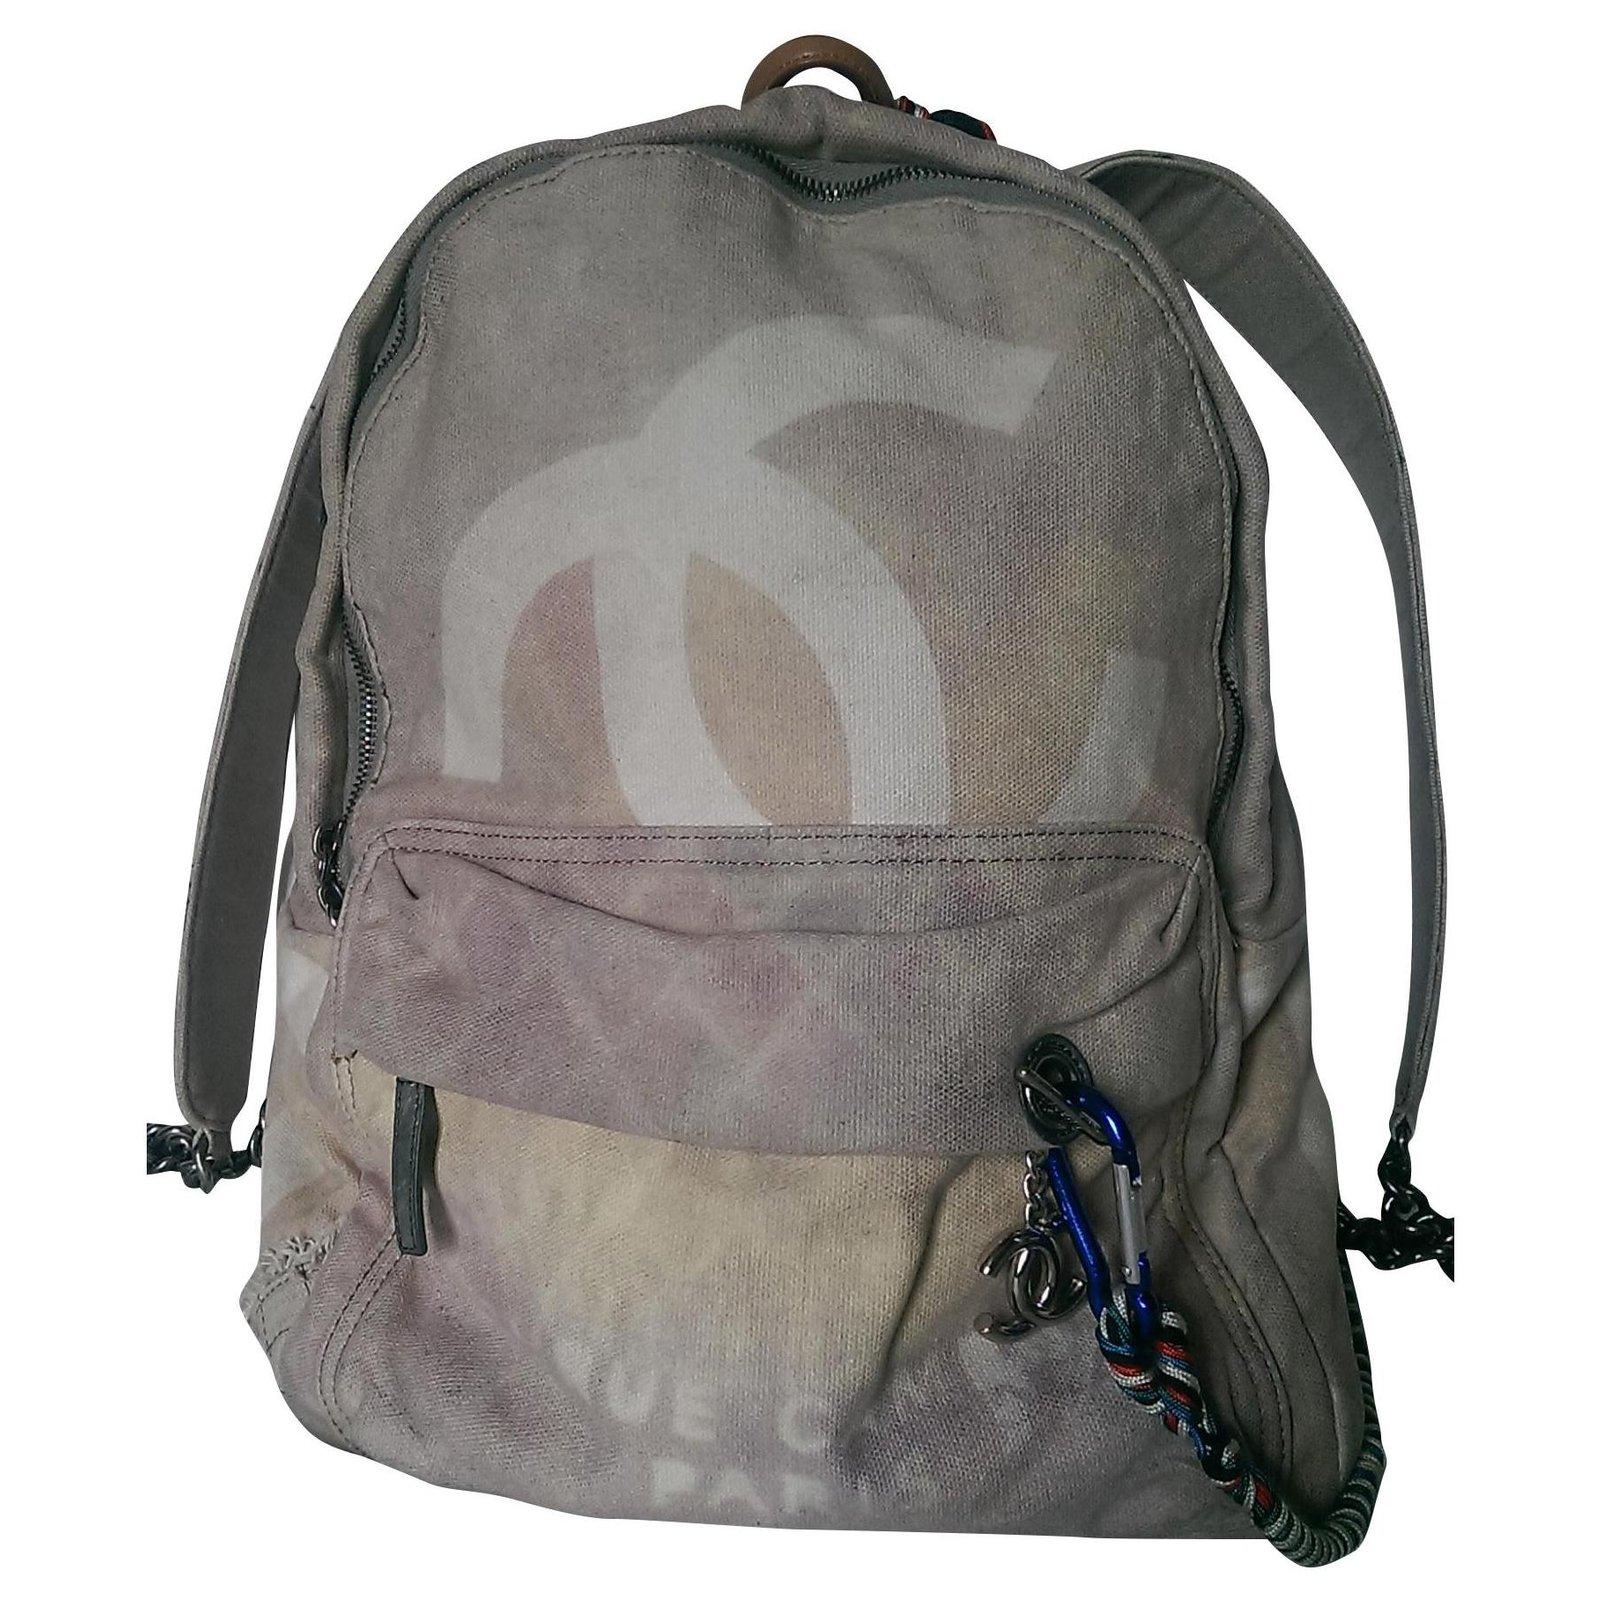 Chanel Ss Graffiti 14 Backpacks Cloth Beige Other Ref 155689 Joli Closet